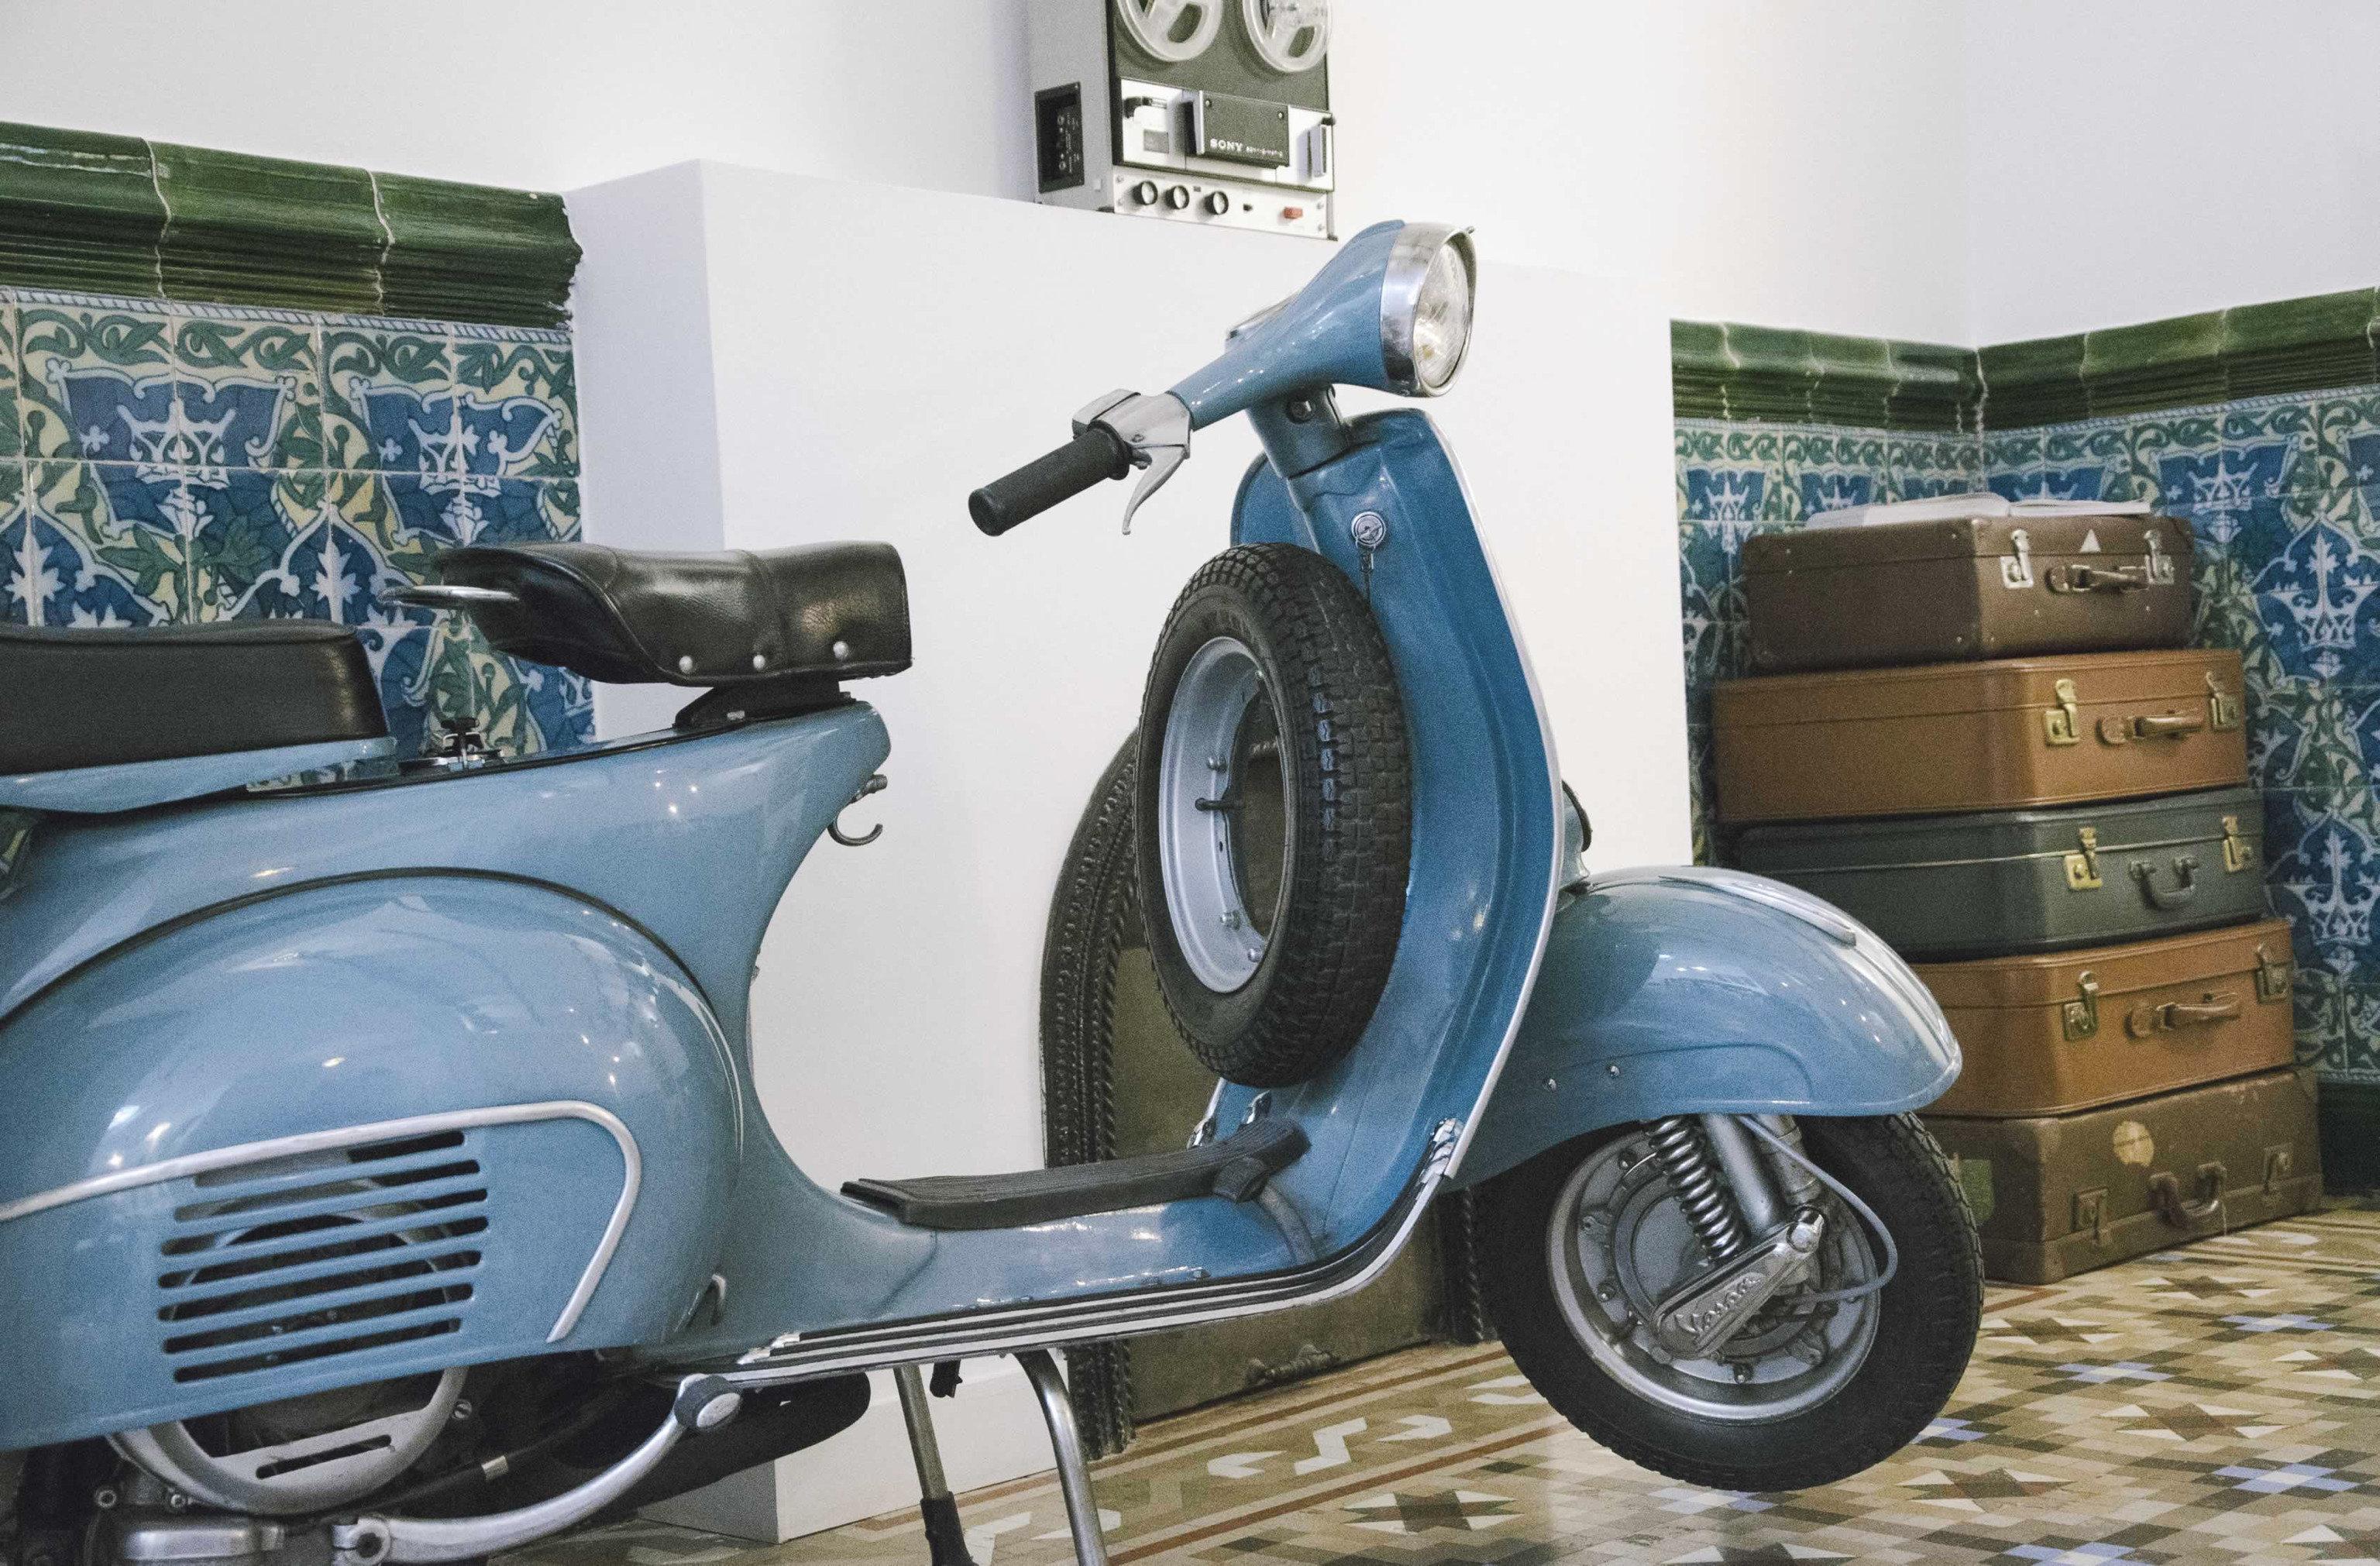 Hotels scooter vespa car indoor parked automotive design motorcycle vehicle blue automobile make seat tiled